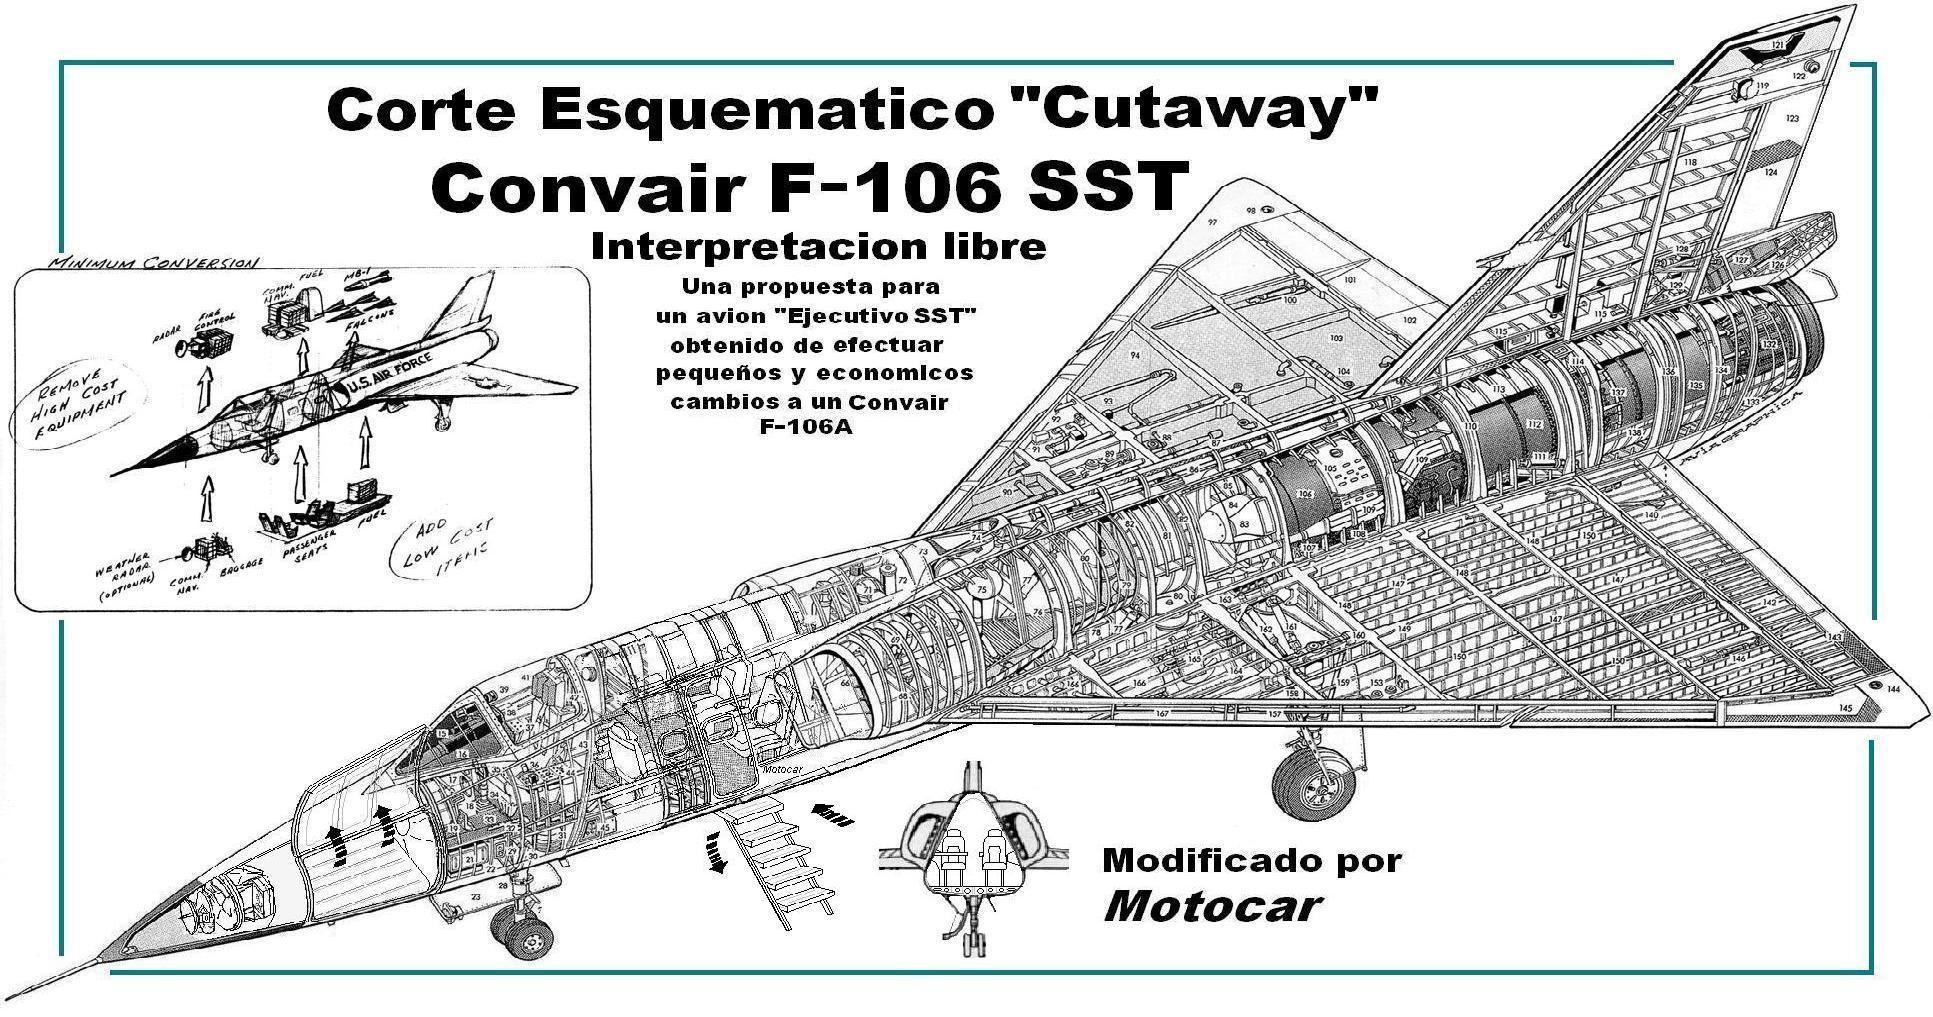 cutaway_convair_f-106a_sst_project_convertionb.jpg